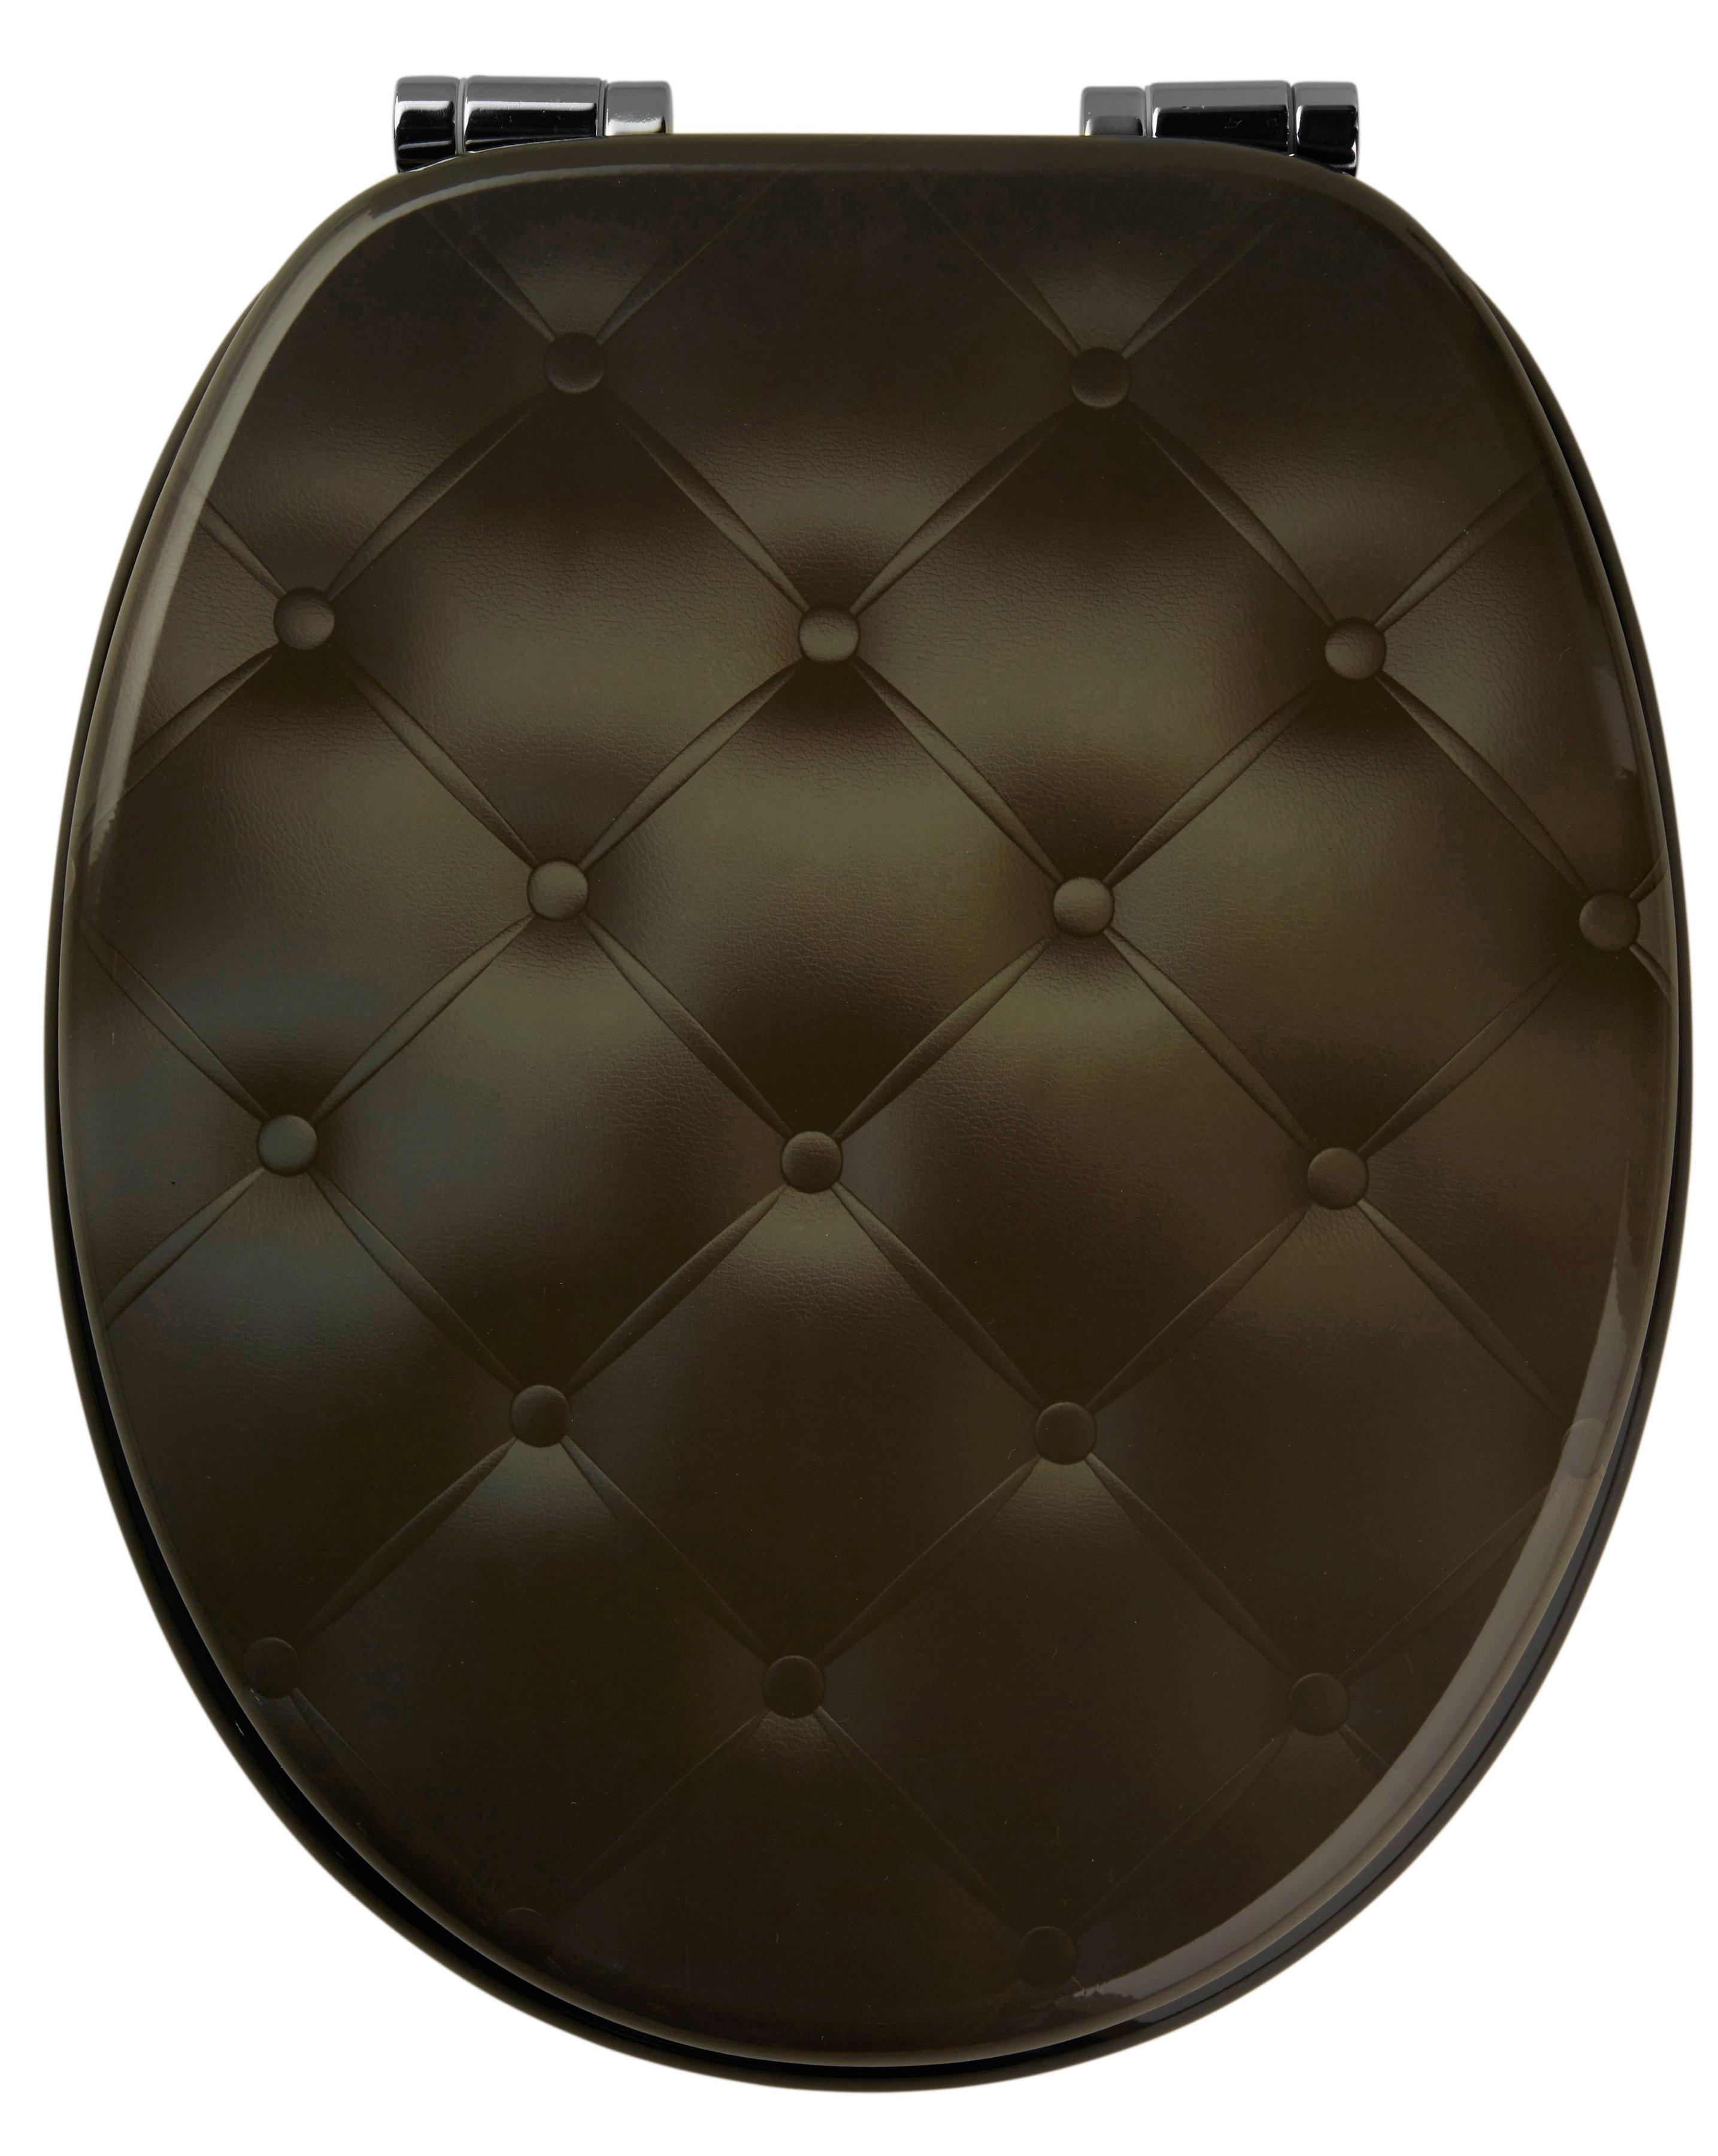 Image of ADOB WC-Sitz